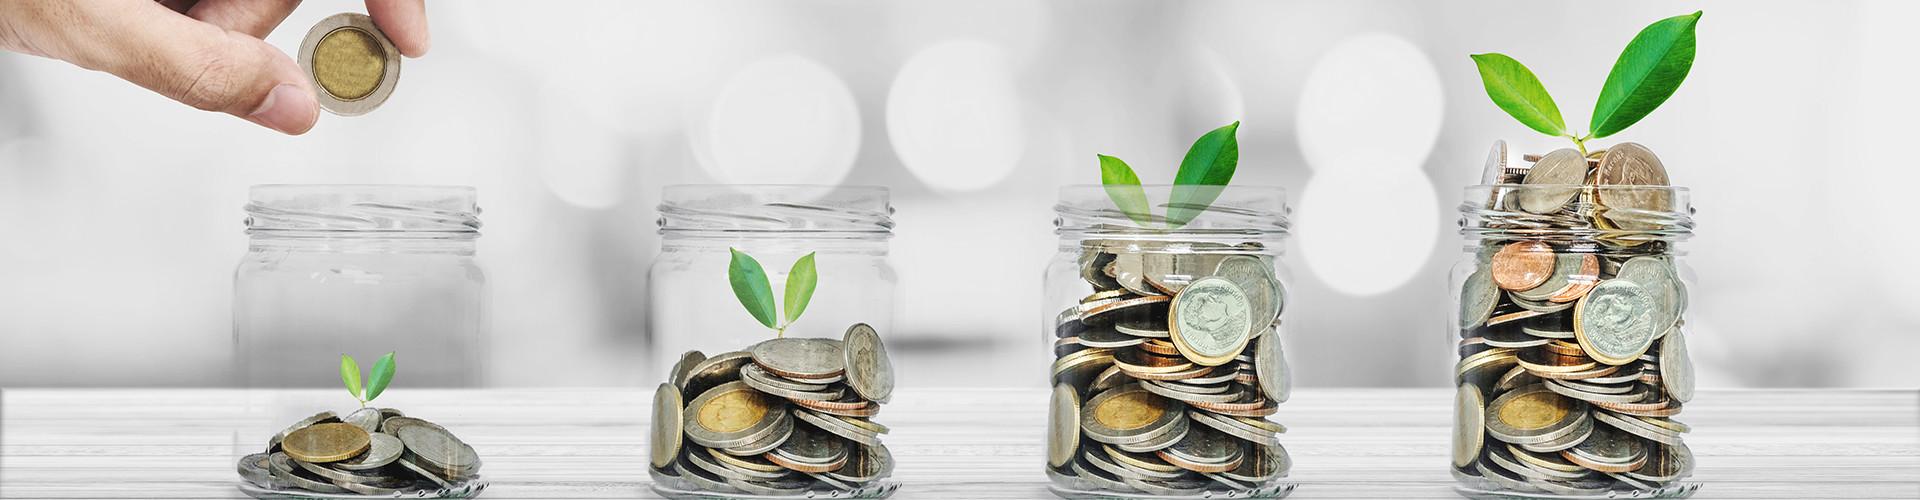 Geld wächst © sasinparaksa , stock.adobe.com